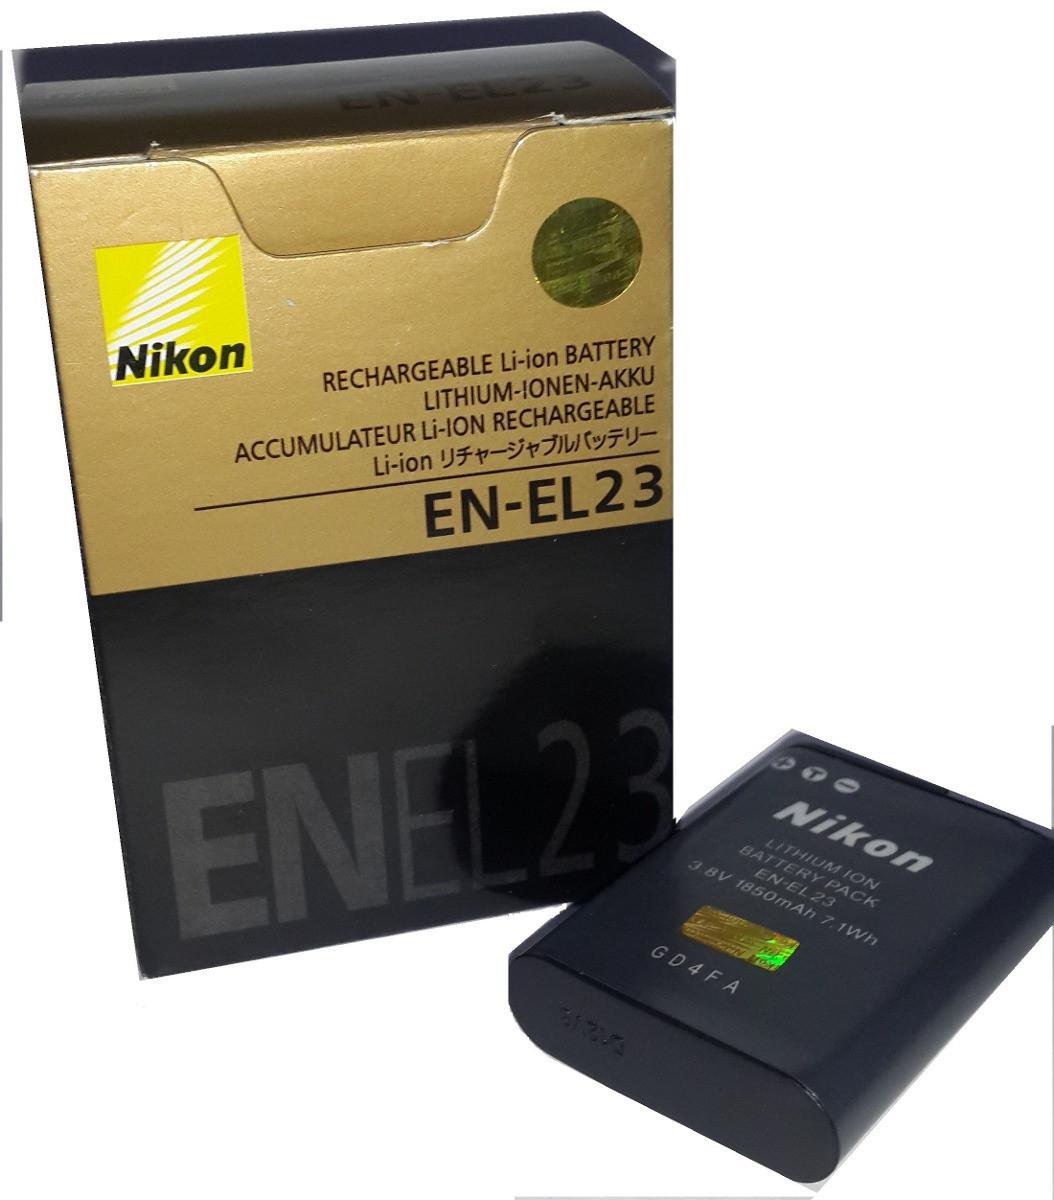 Аккумулятор EN-EL23 для фотоаппаратов Nikon Coolpix P600, S810C, S810, P900, P900s